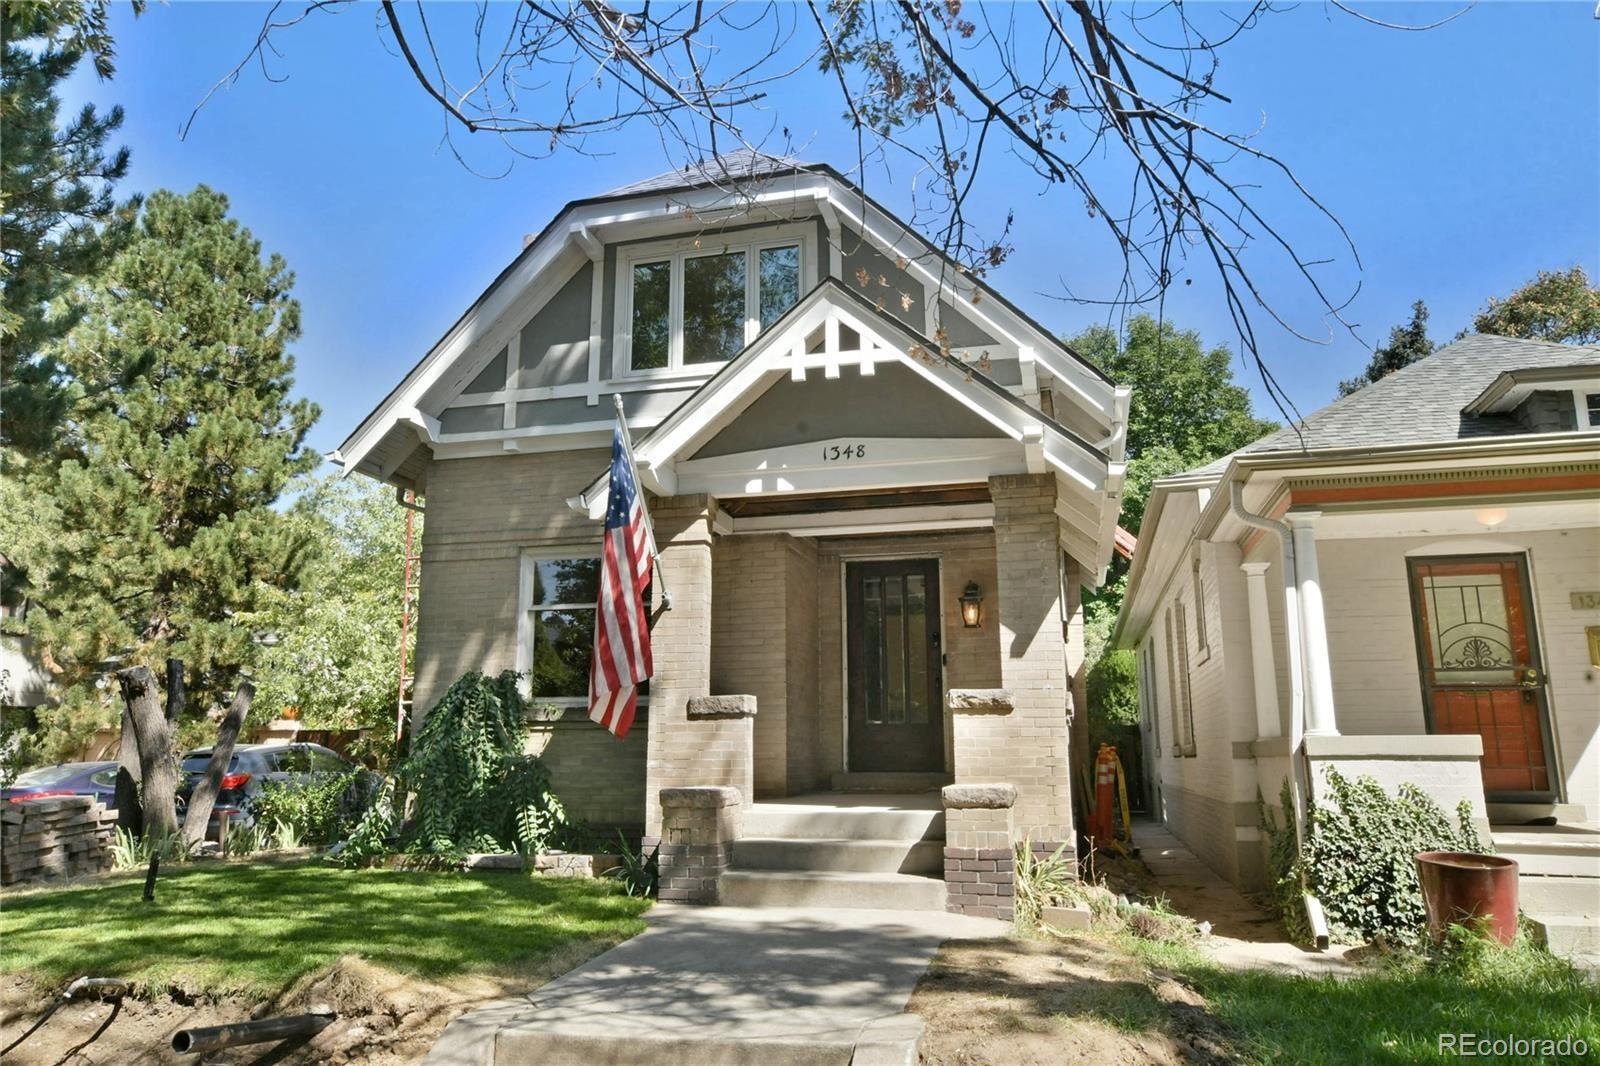 1348 N Humboldt Street, Denver, CO 80218 - MLS#: 6779639